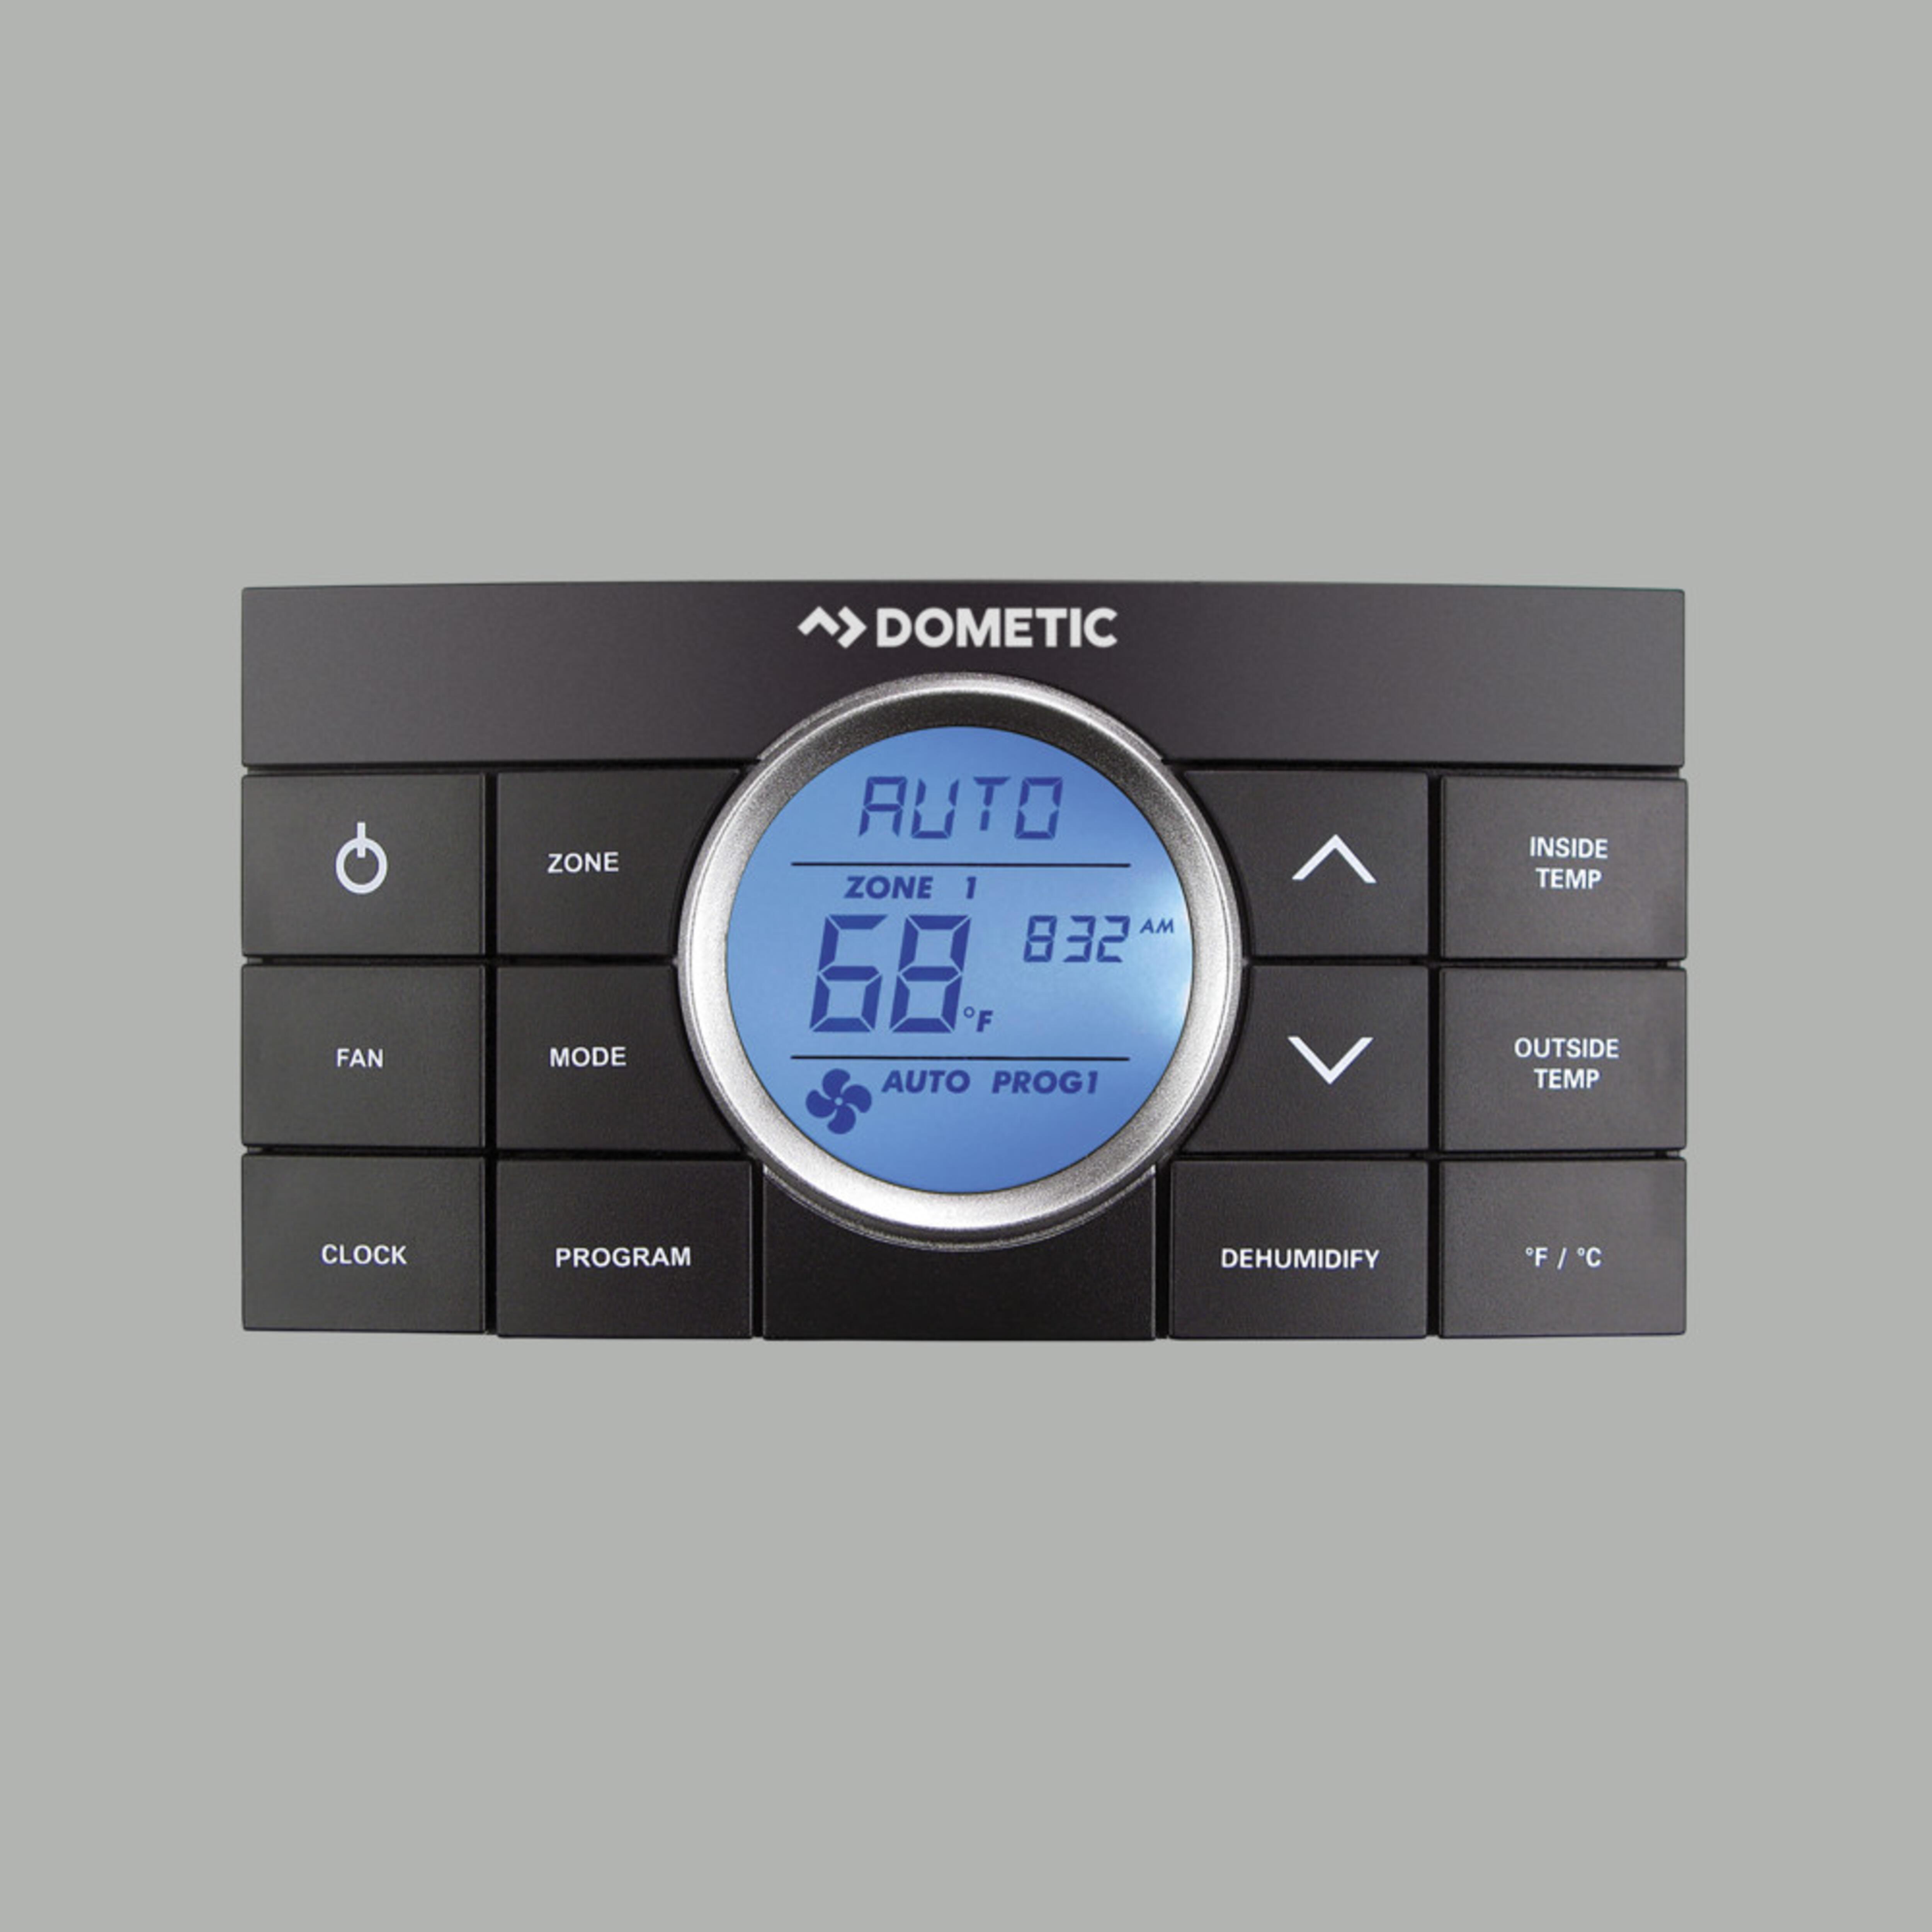 Dometic Comfort Control Center